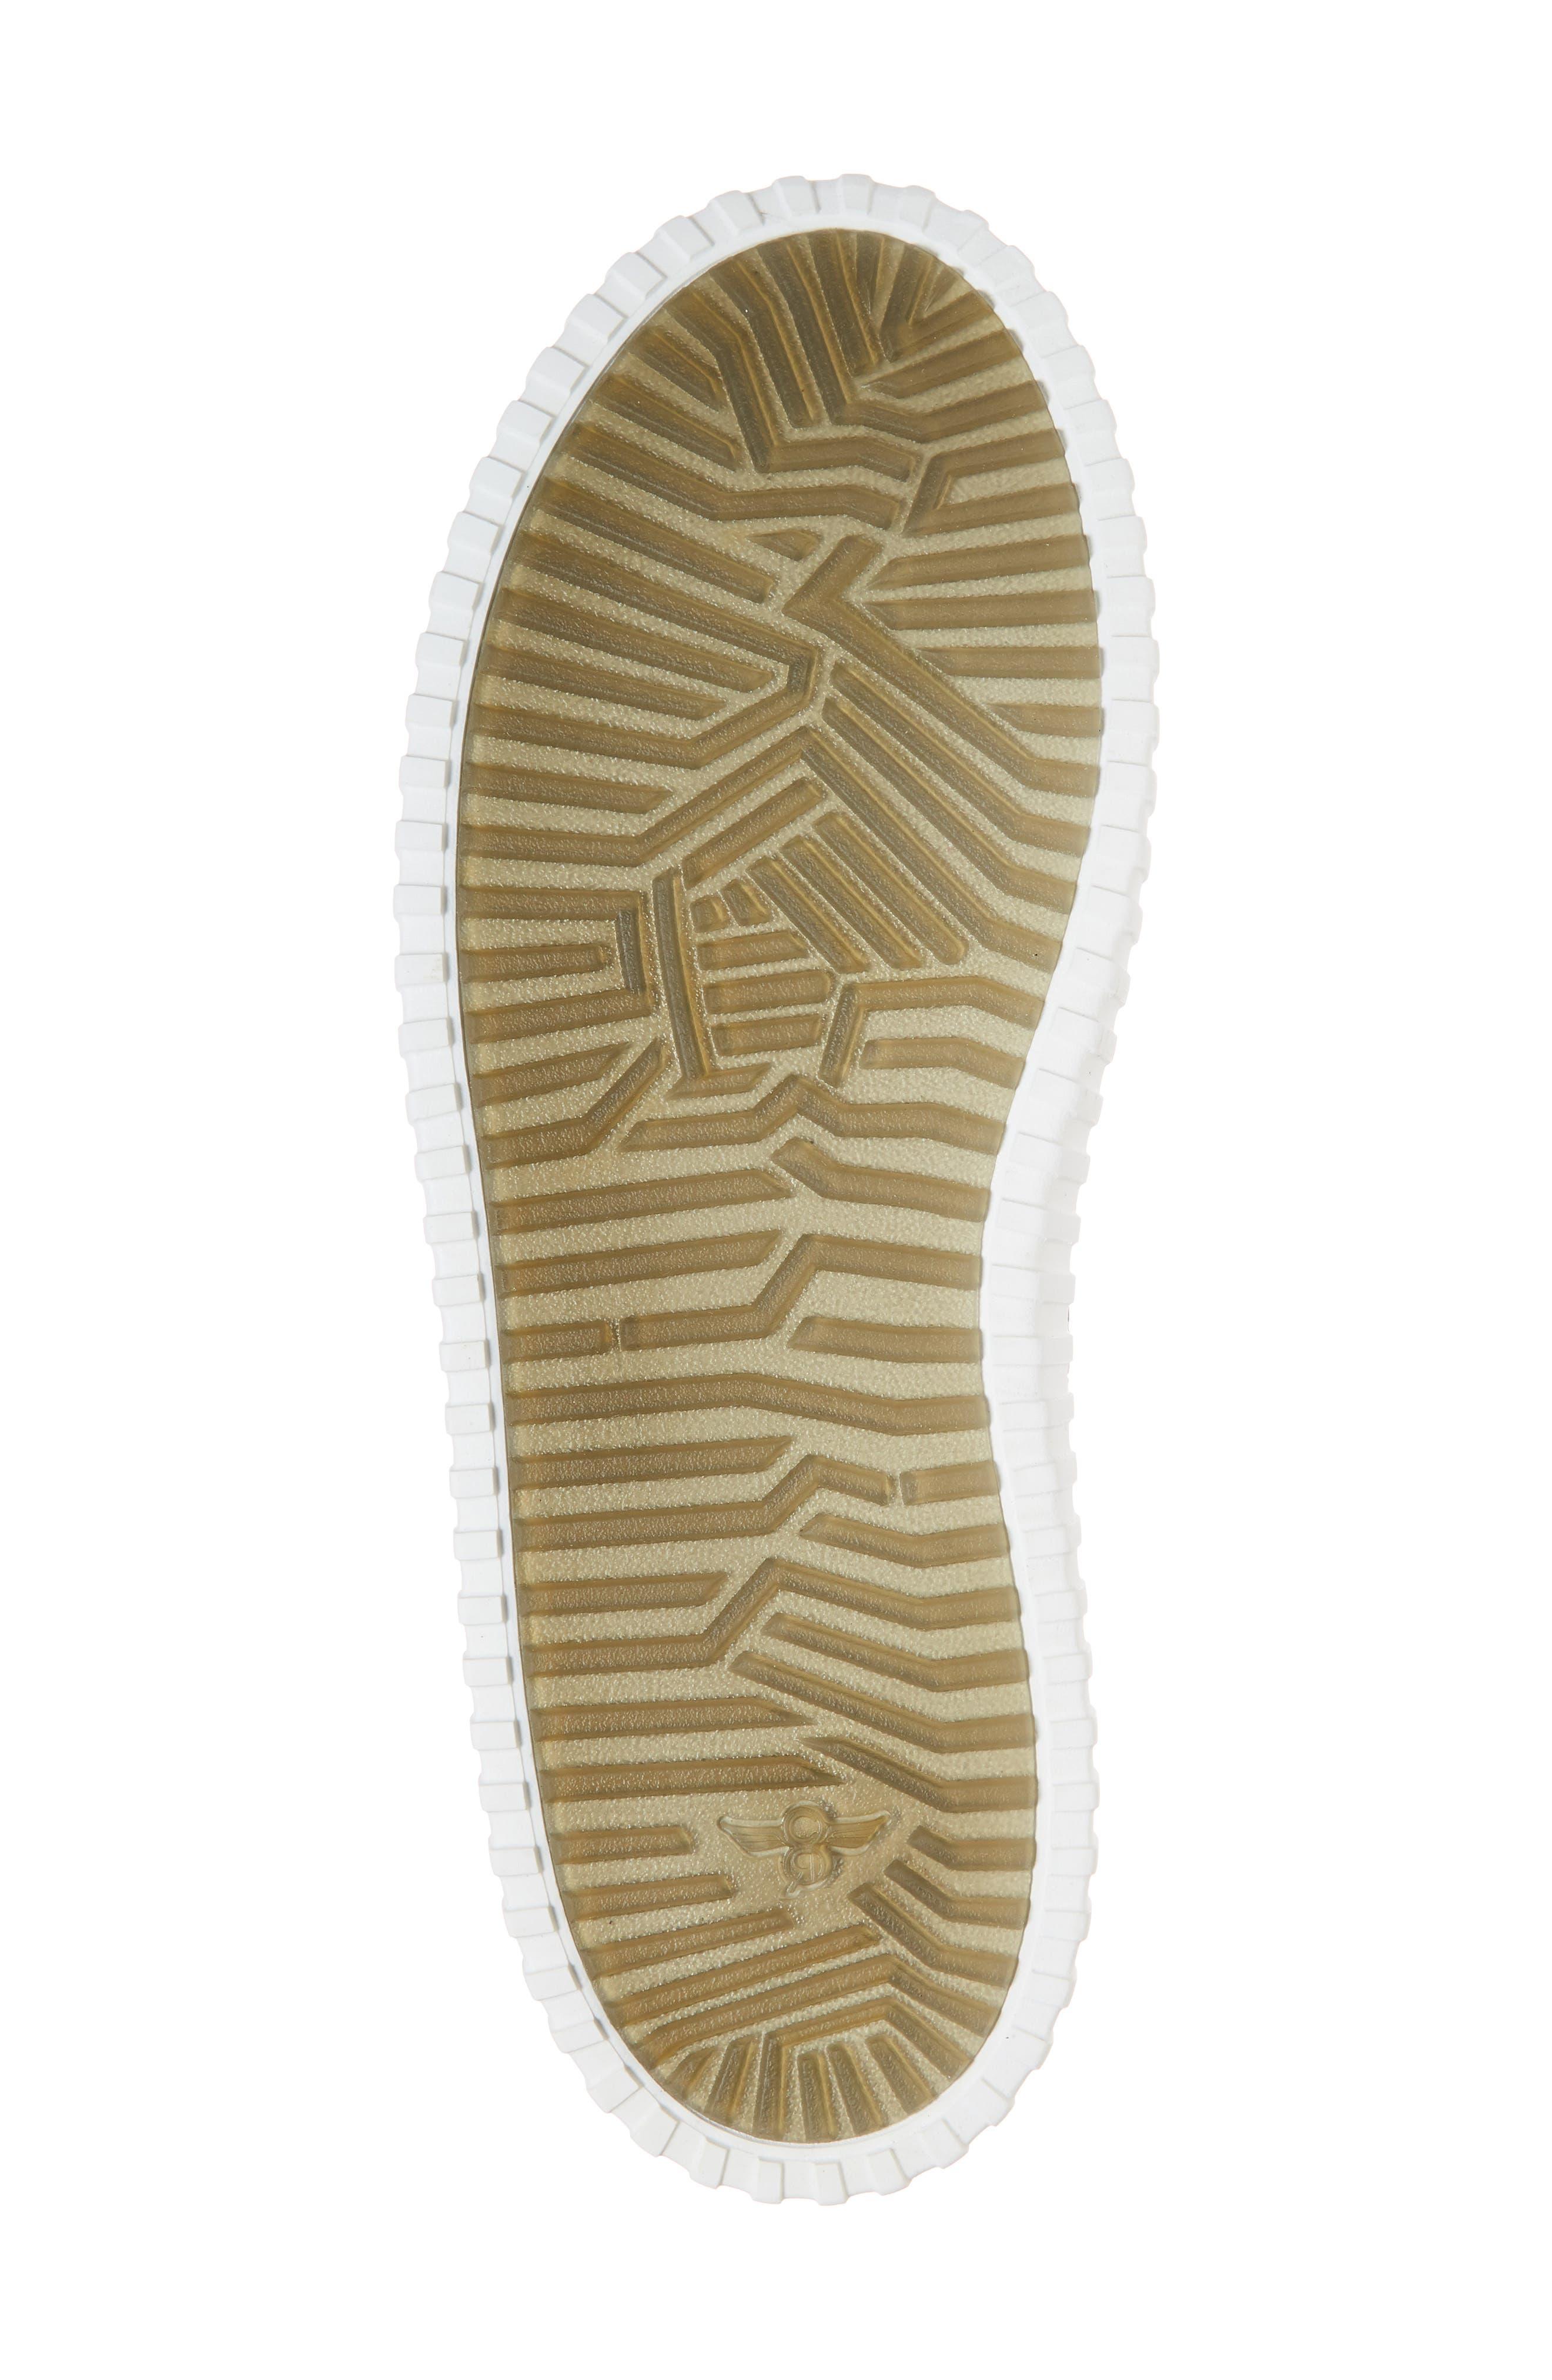 Castucci Knit Sneaker,                             Alternate thumbnail 6, color,                             021